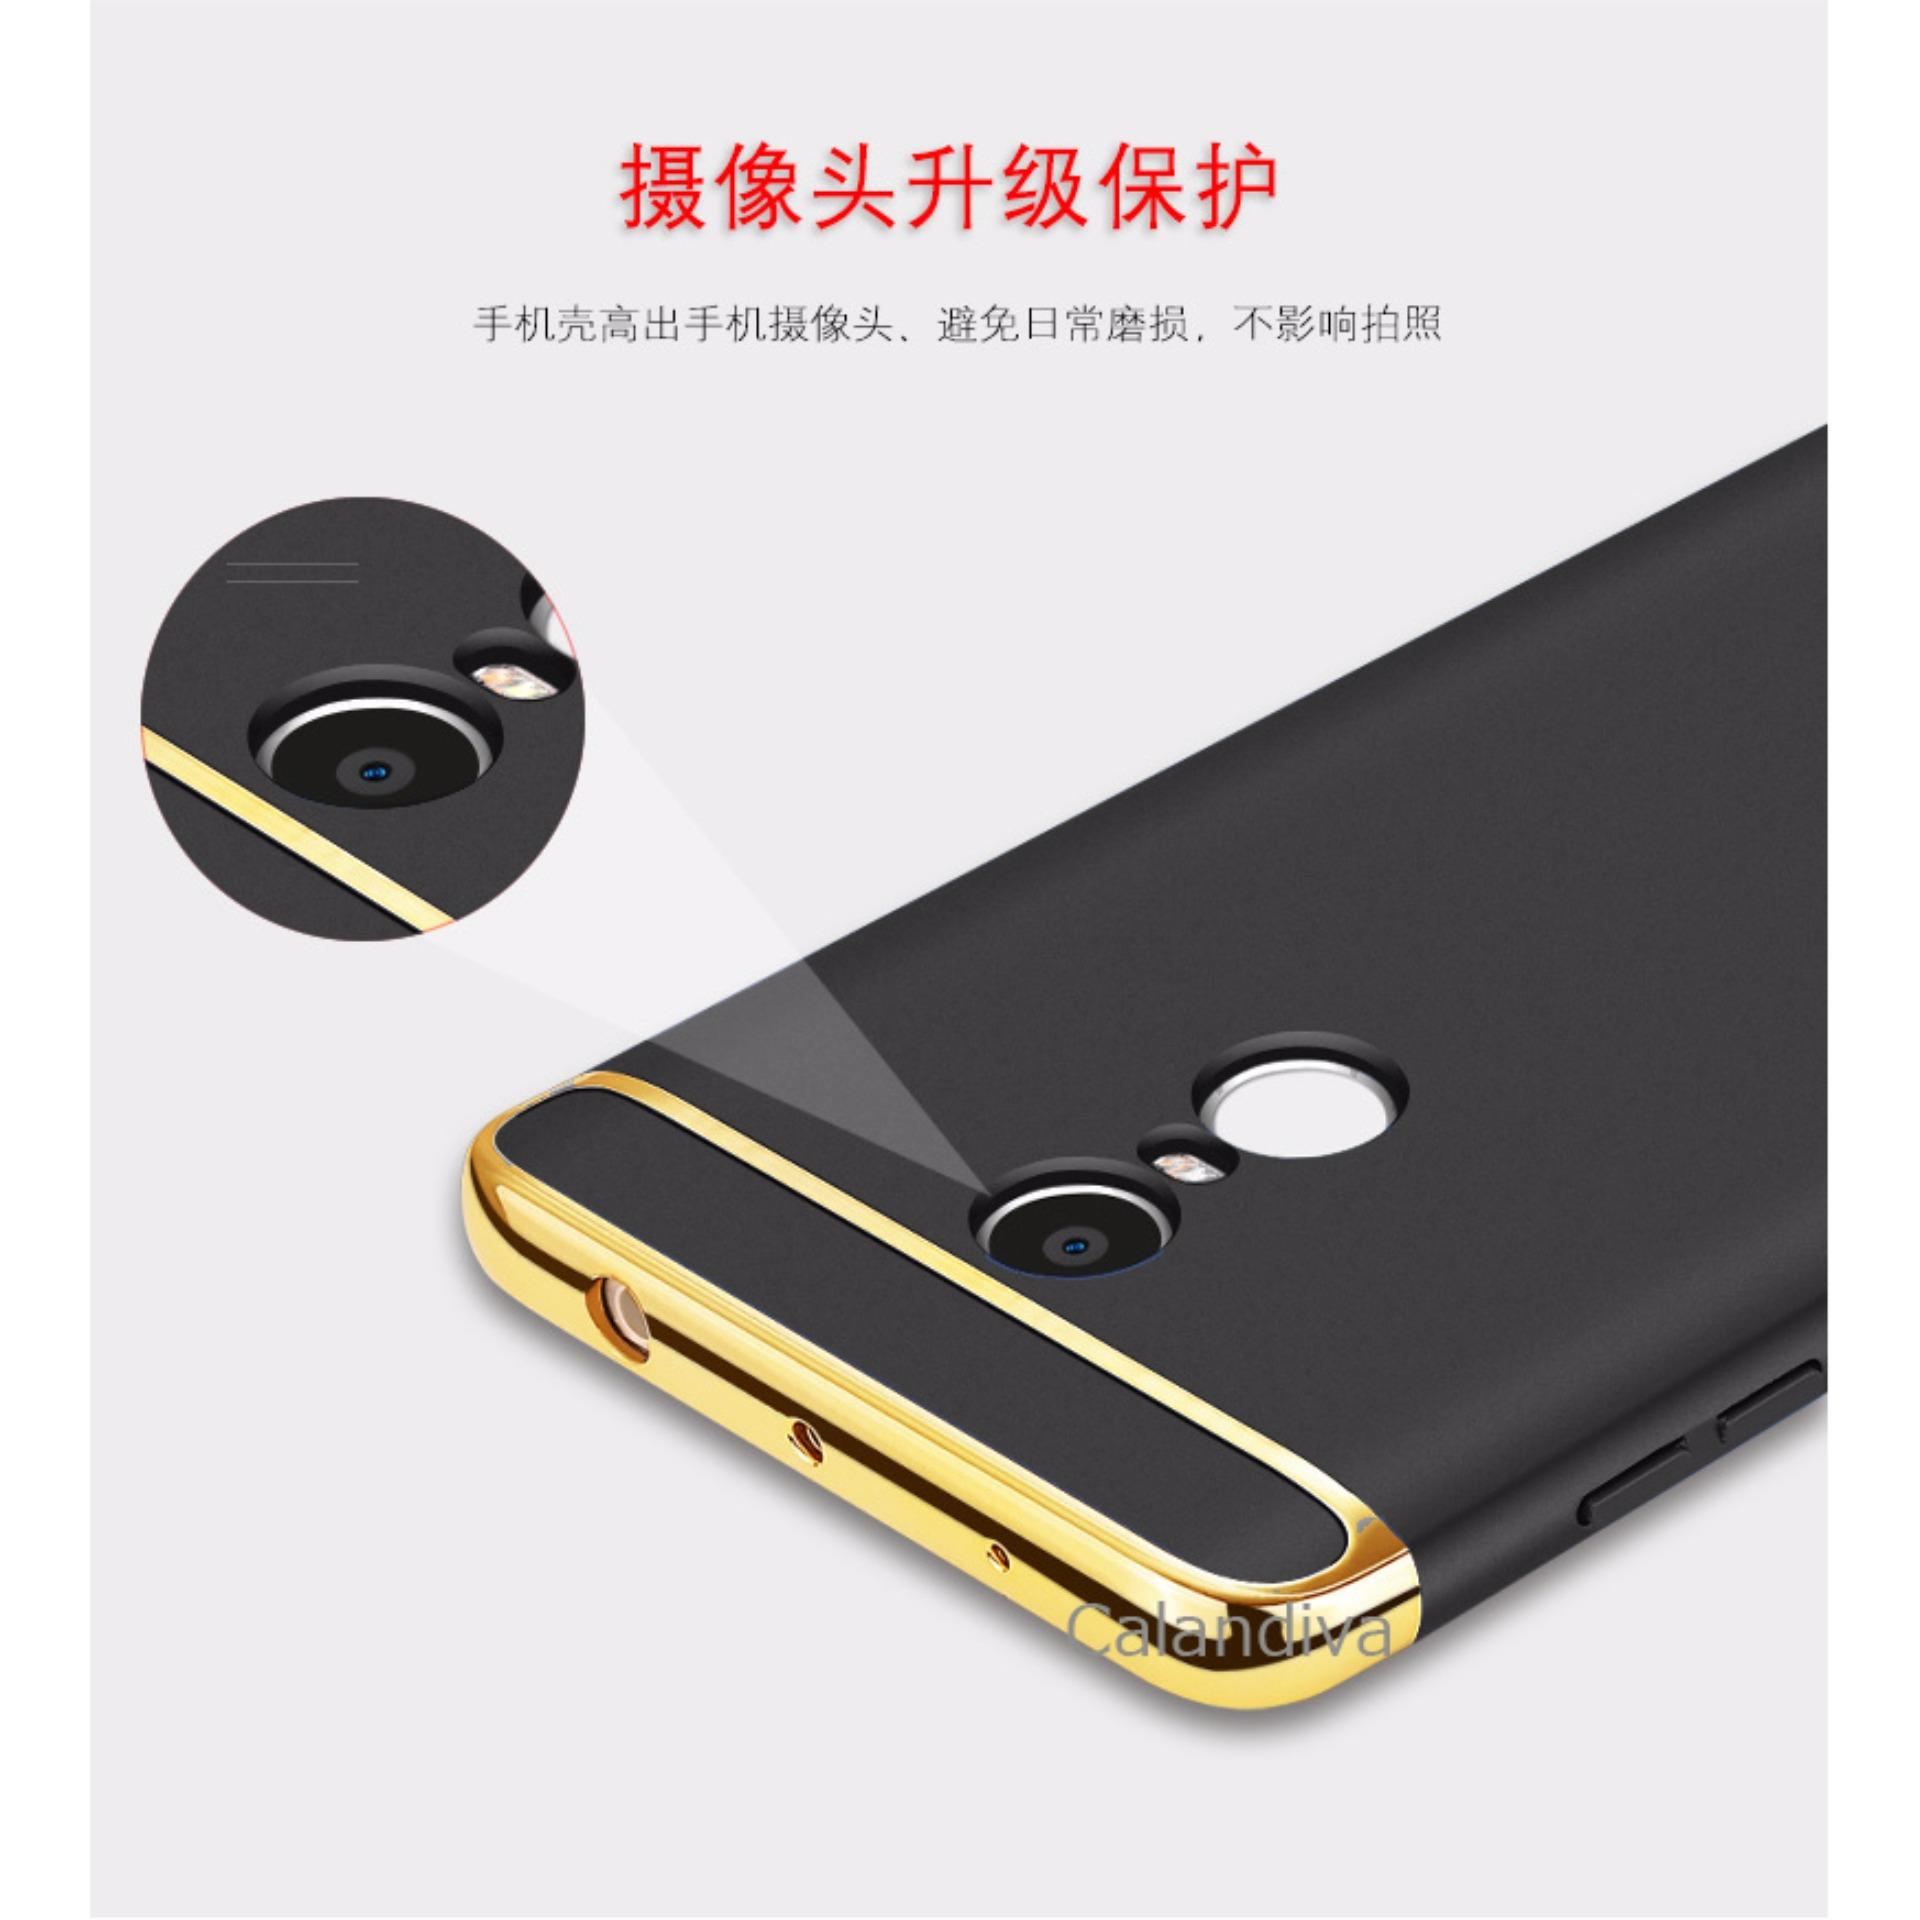 Calandiva Premium Quality Elegance Protection Hardcase for Xiaomi Redmi Note 4 Mediatek / Redmi Note 4x ...